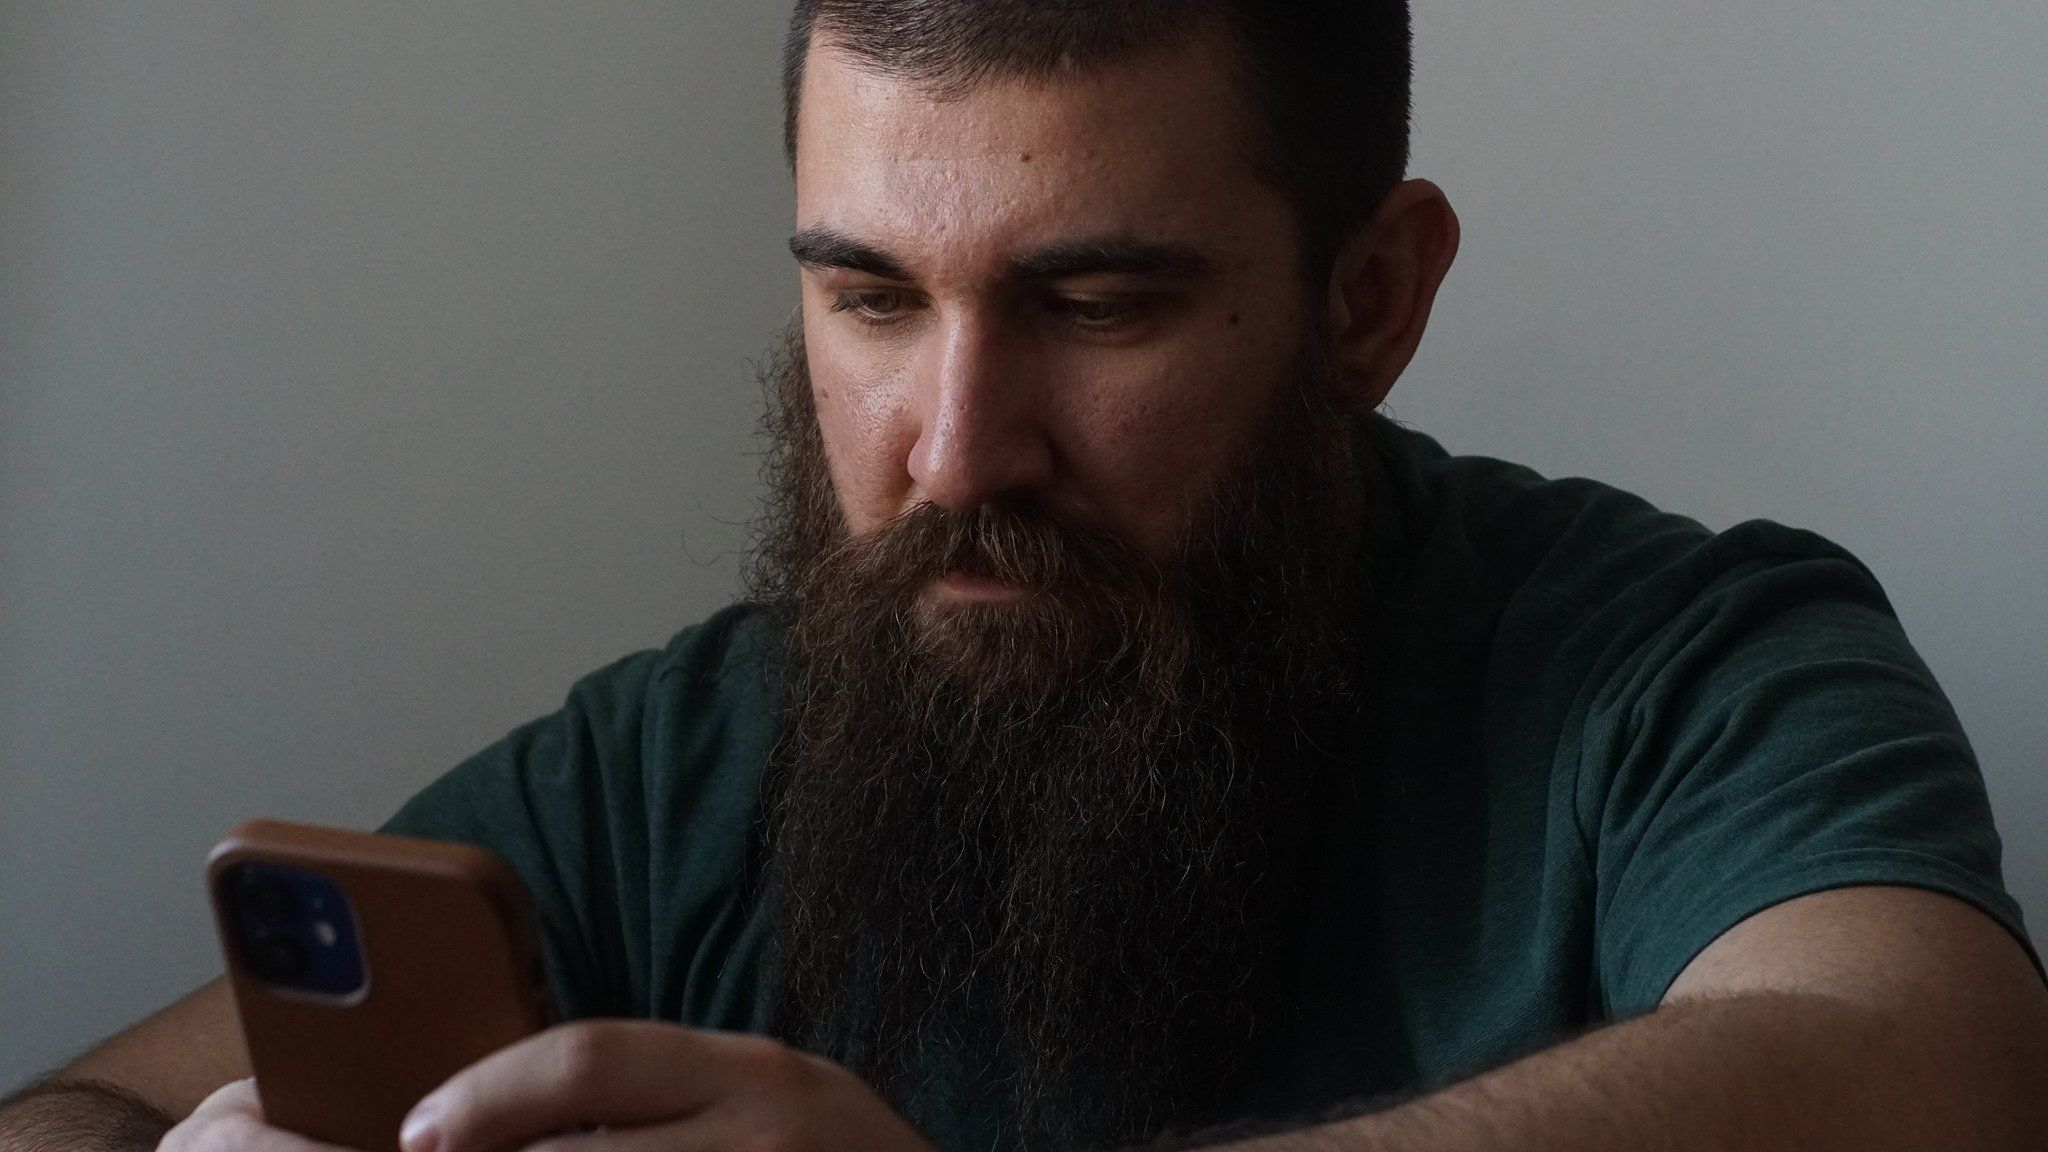 Lazar Nikolov Hacker Noon profile picture